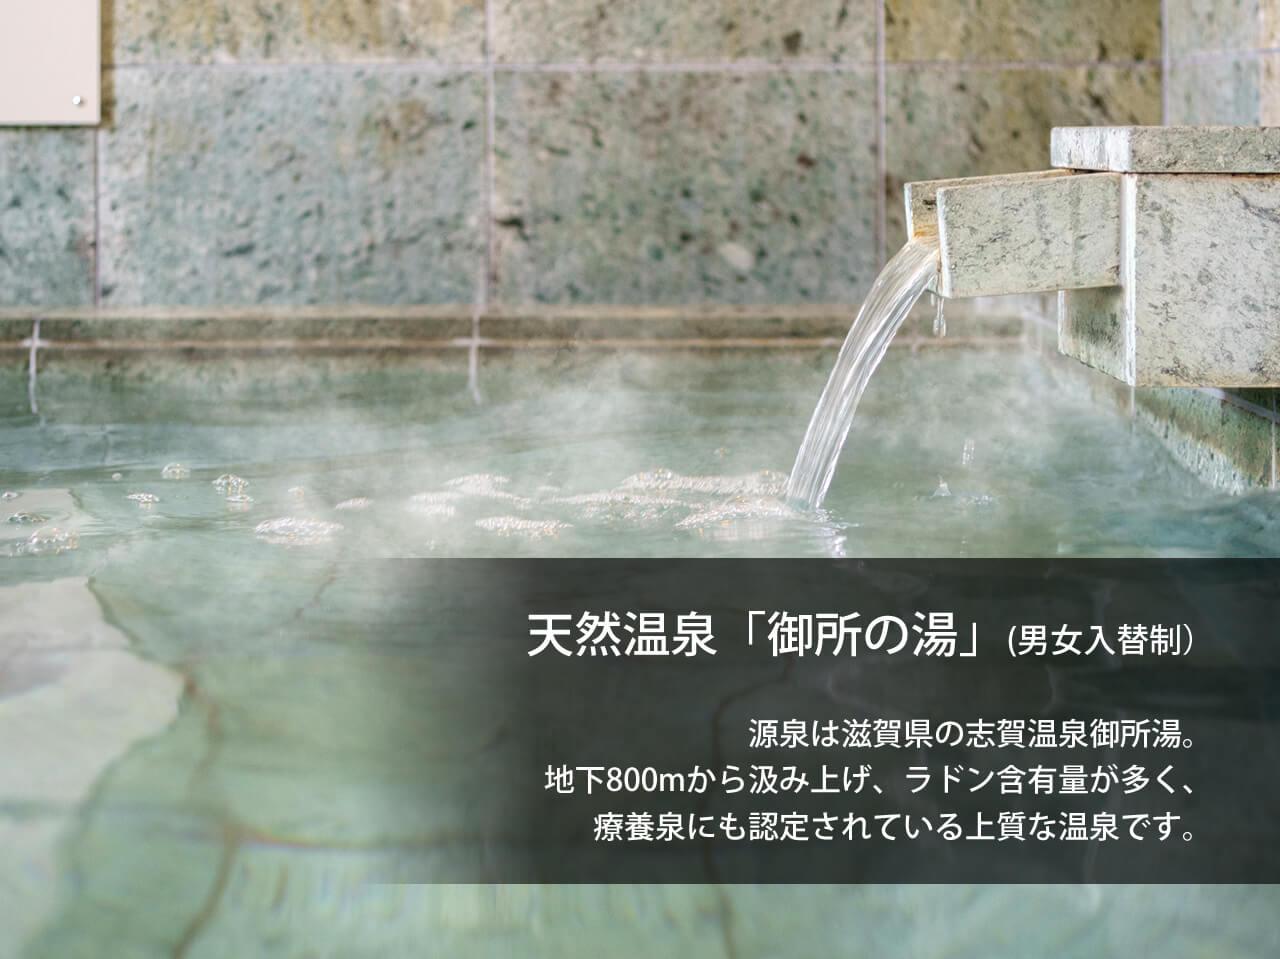 Super Hotel Kyoto Shijo Kawaramachi